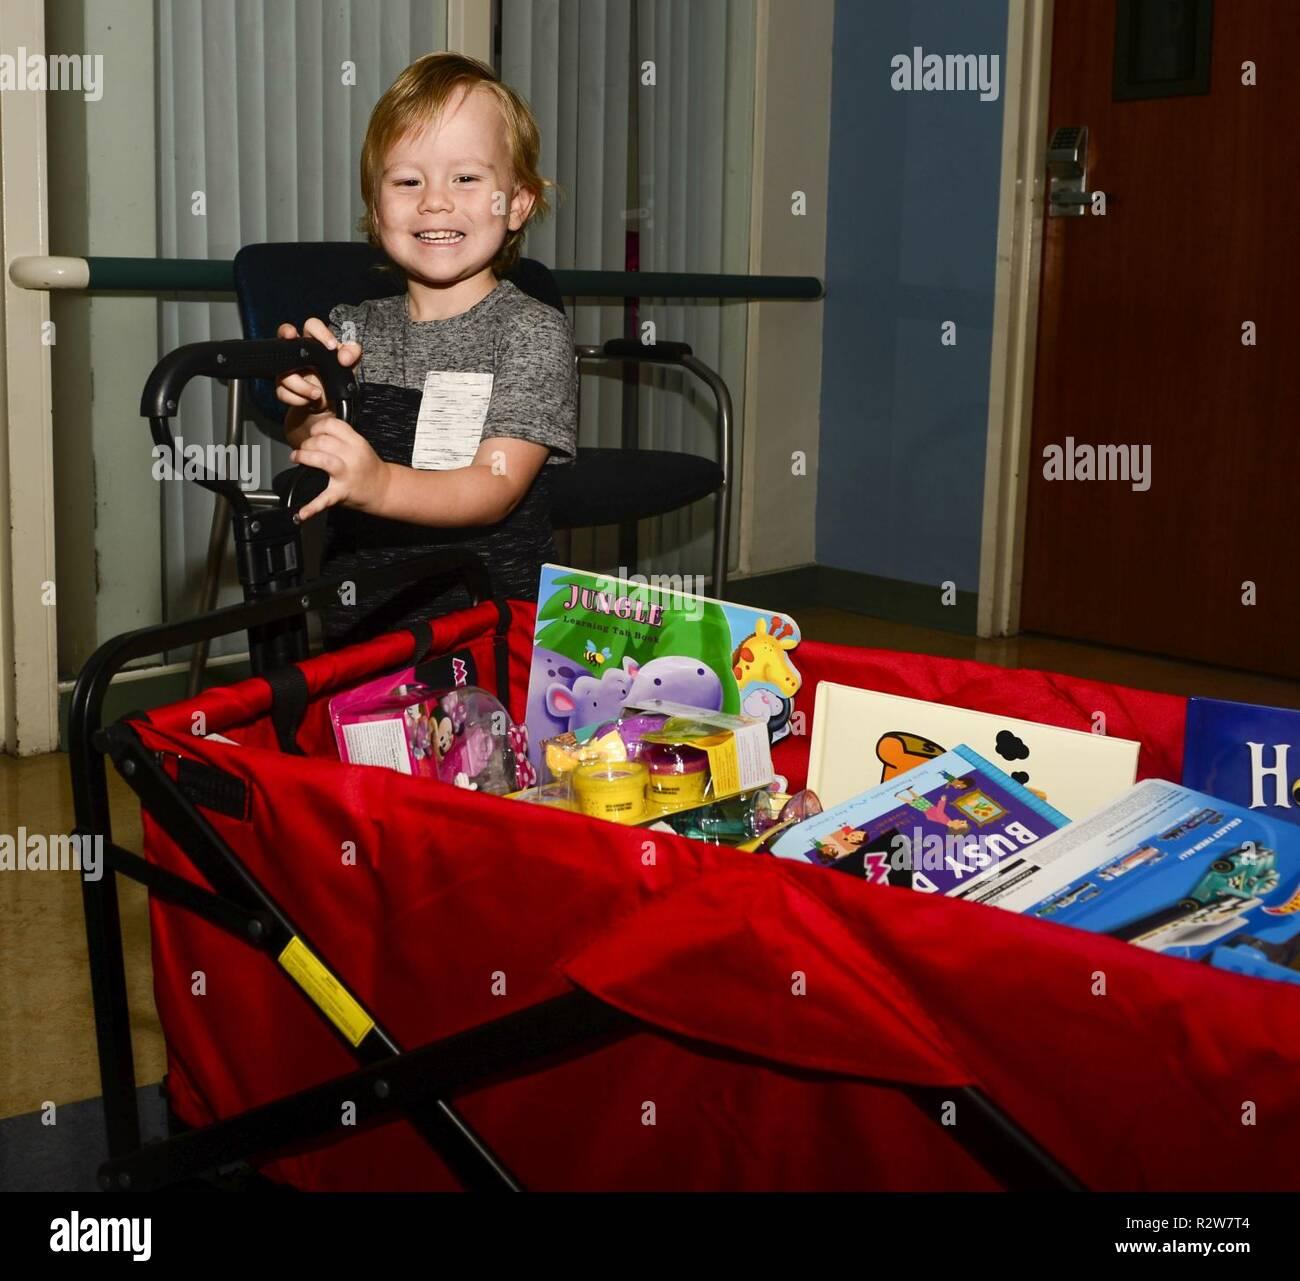 Pediatric Oncology Stock Photos & Pediatric Oncology Stock